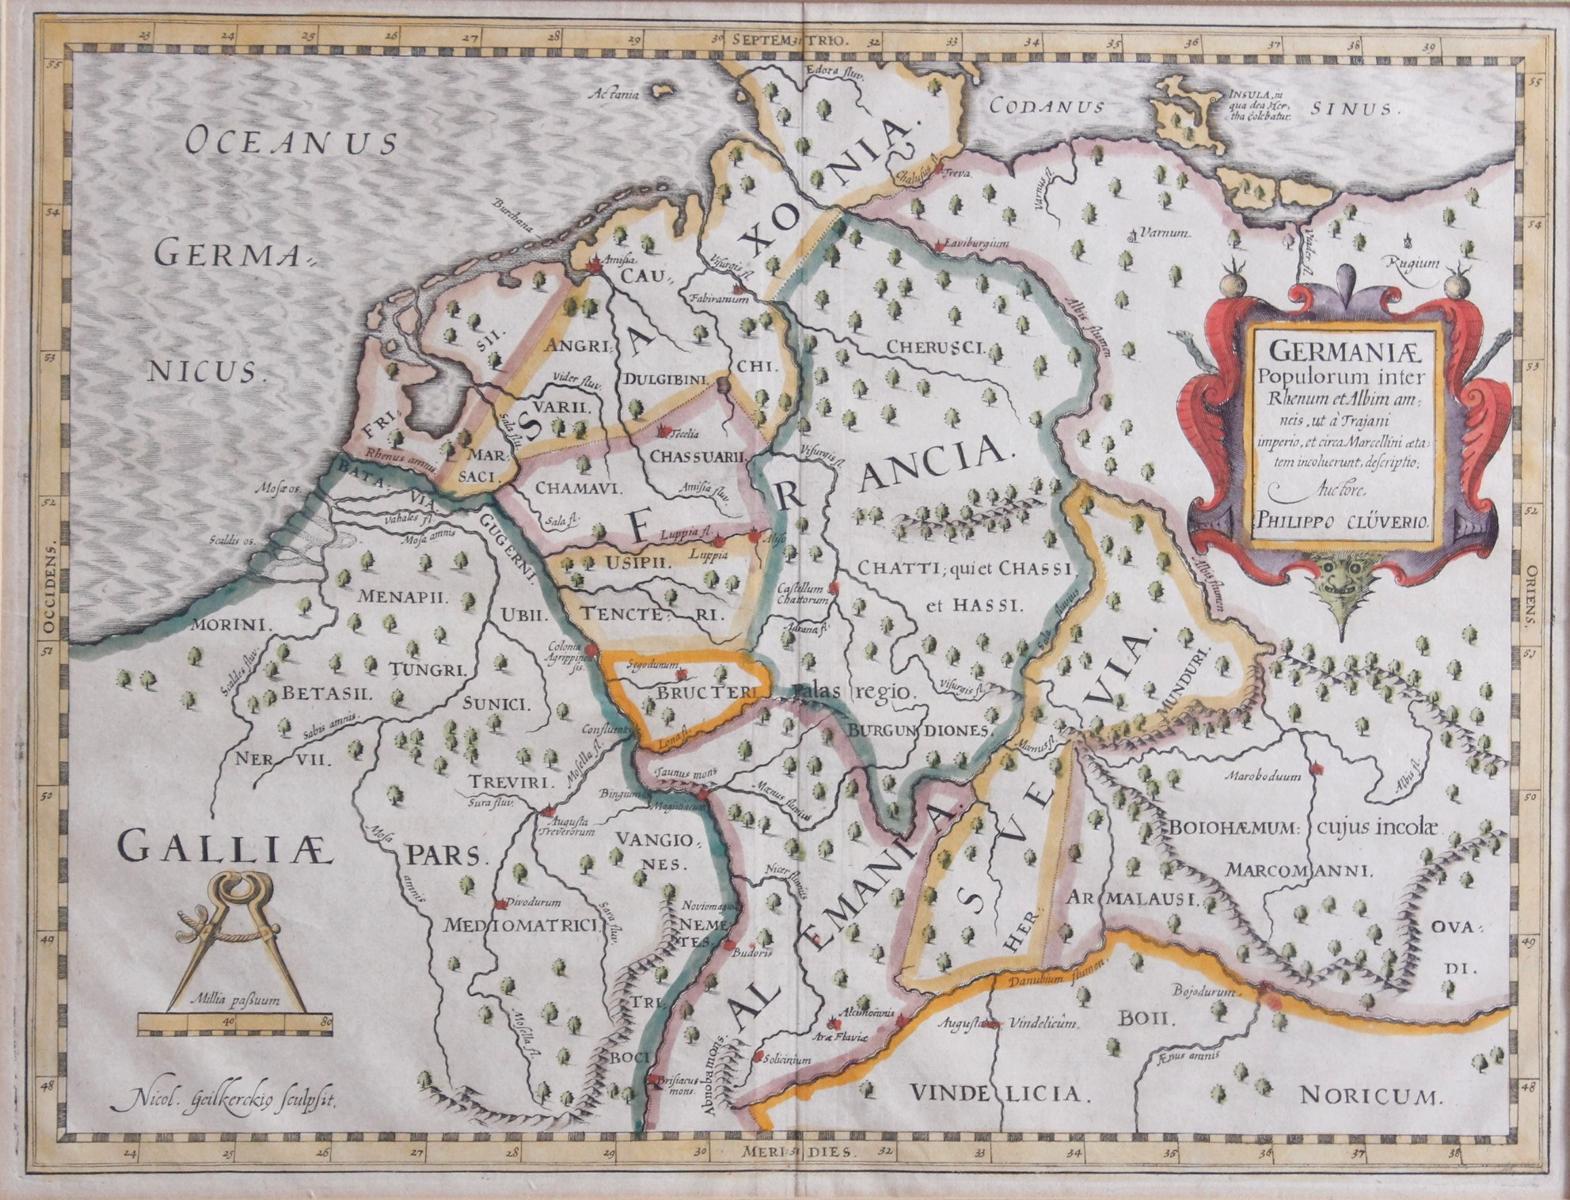 Kupferstich aus dem 17. Jh. Germania Populorum inter Rhenum et Albim am neis ut a Trajani-2